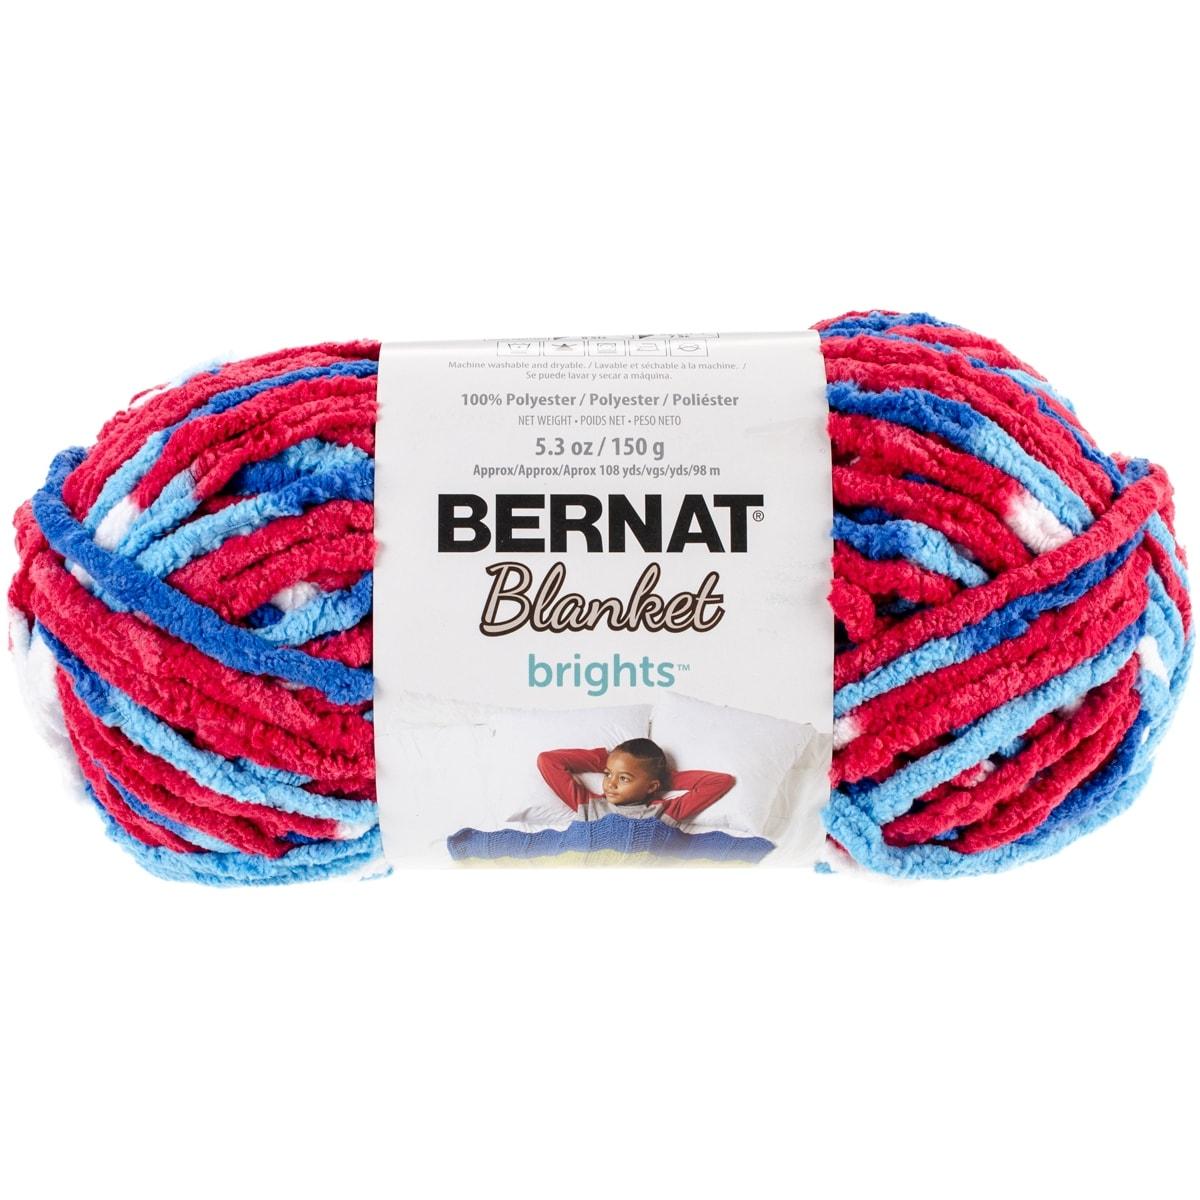 Shop Bernat Blanket Brights Yarn-Red, White & Boom Variegated - red ...